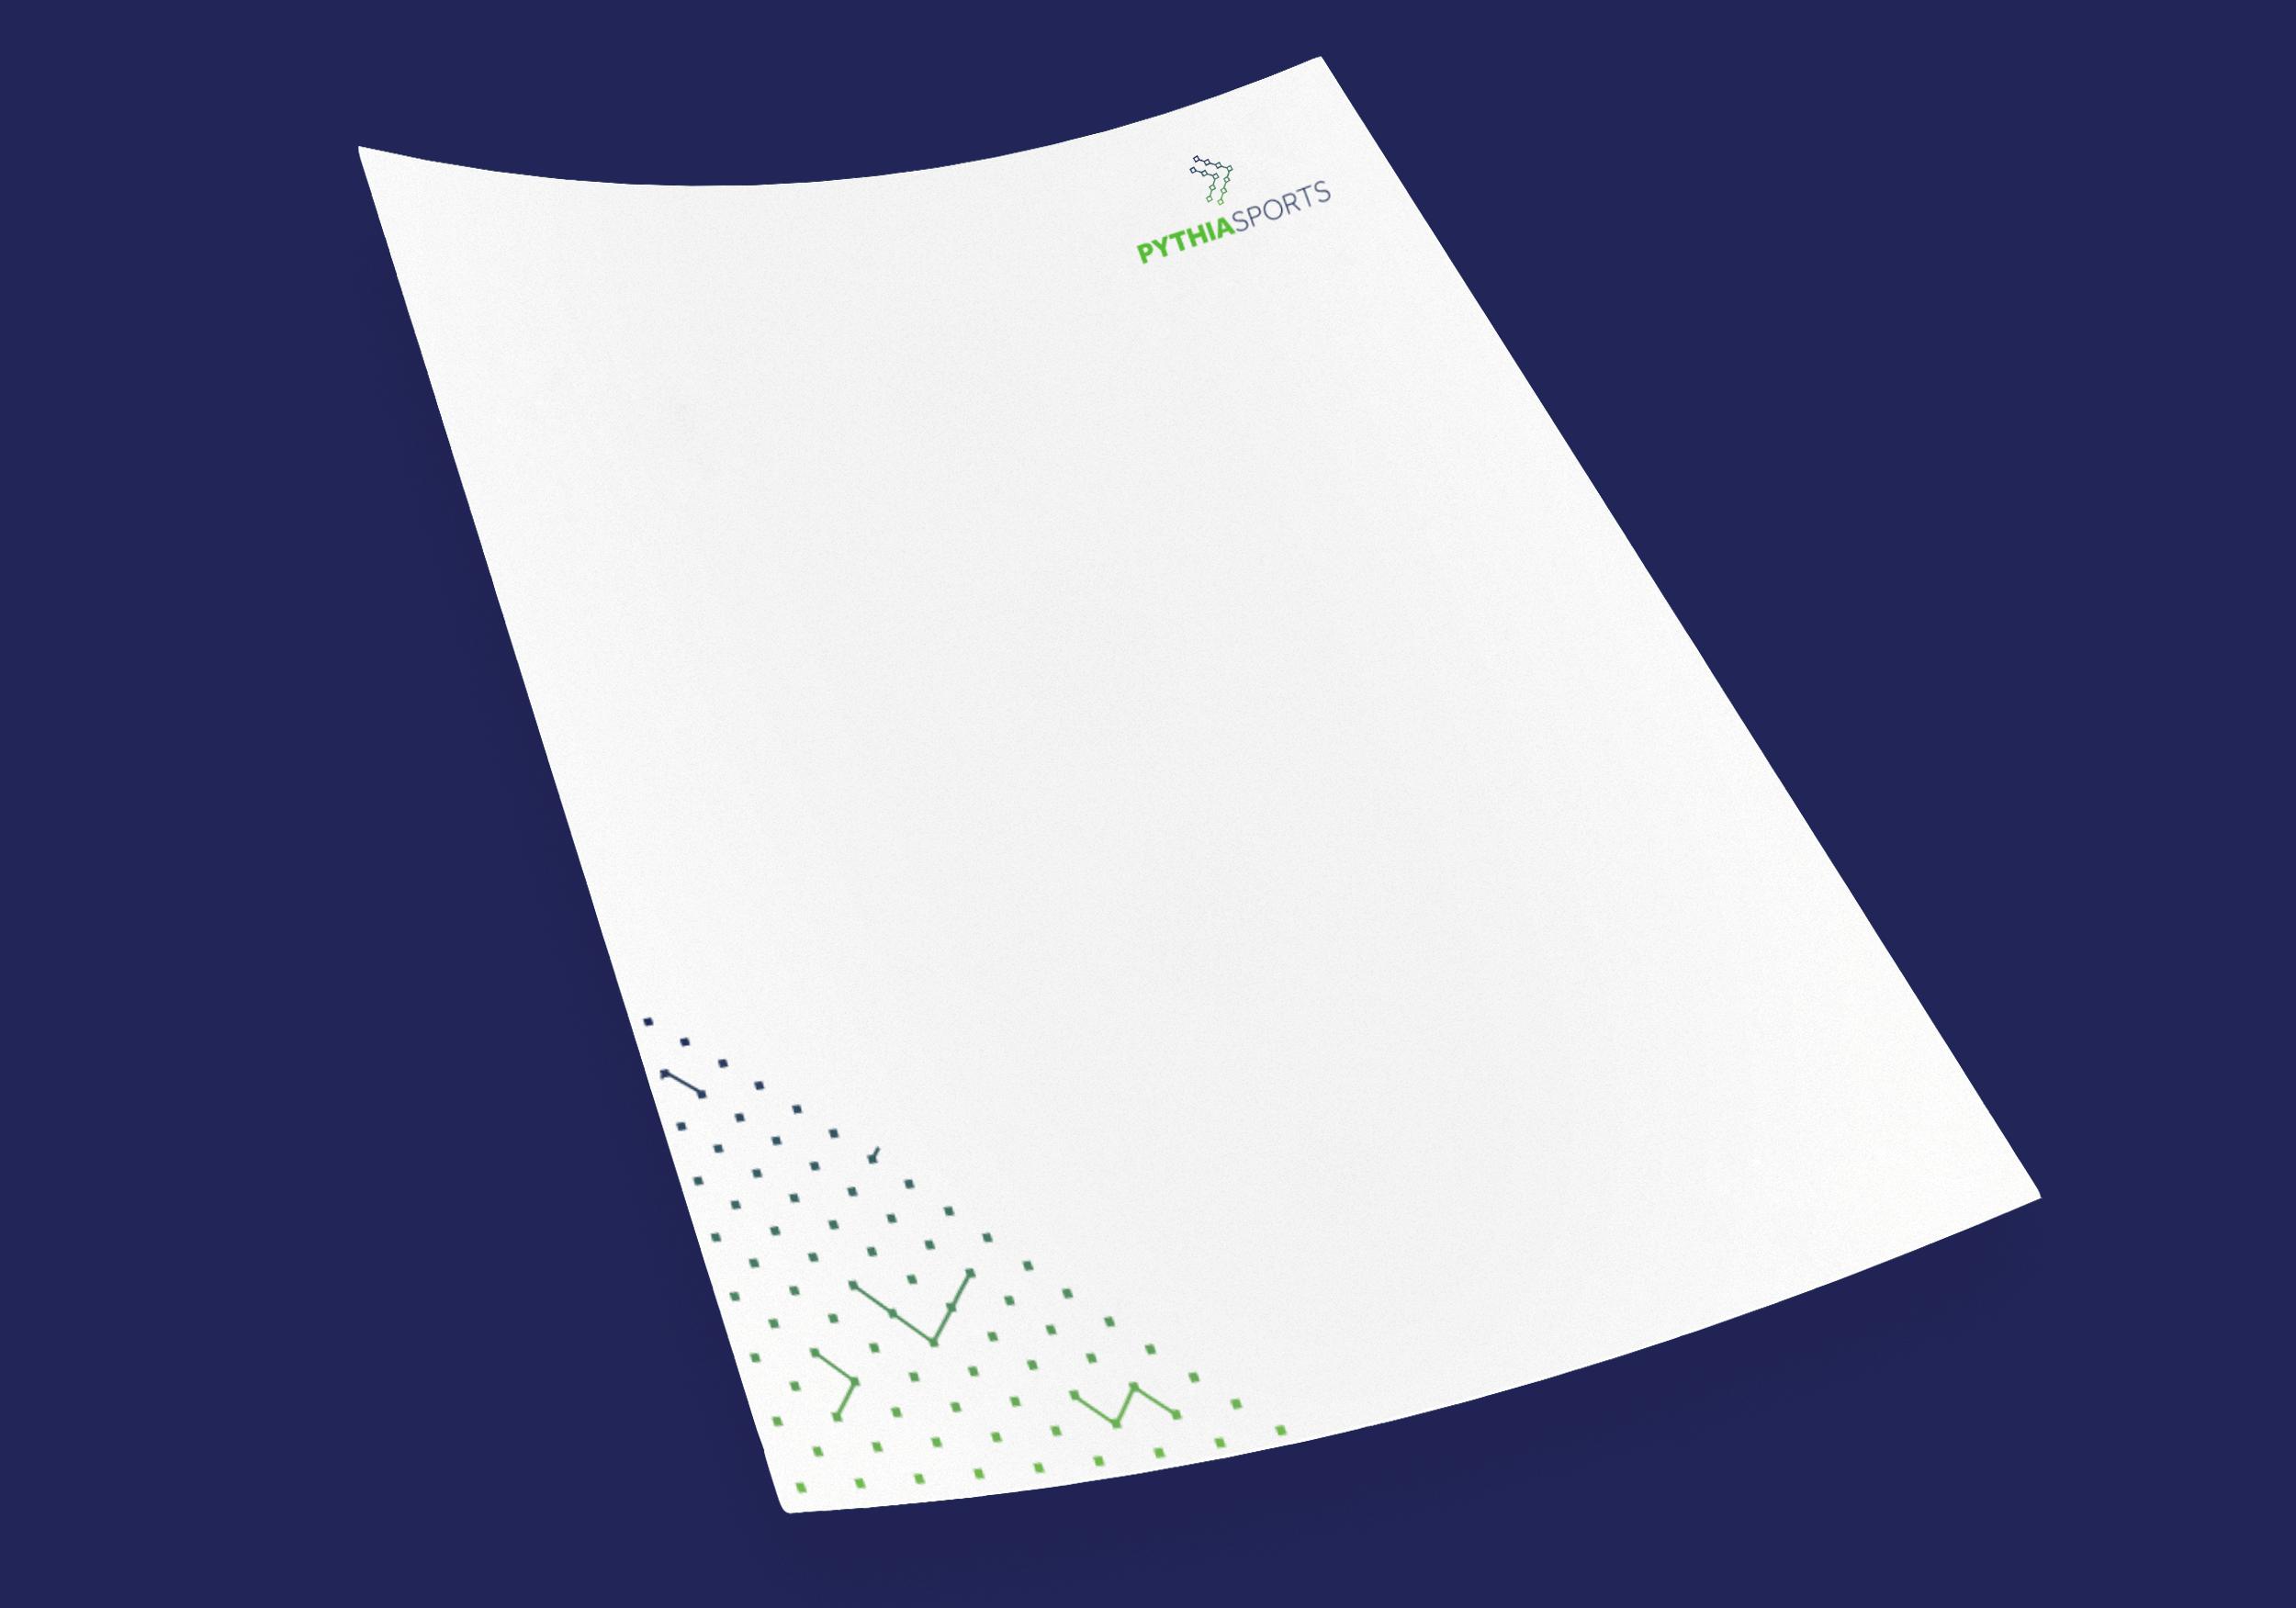 pythiasports-letter-mockup